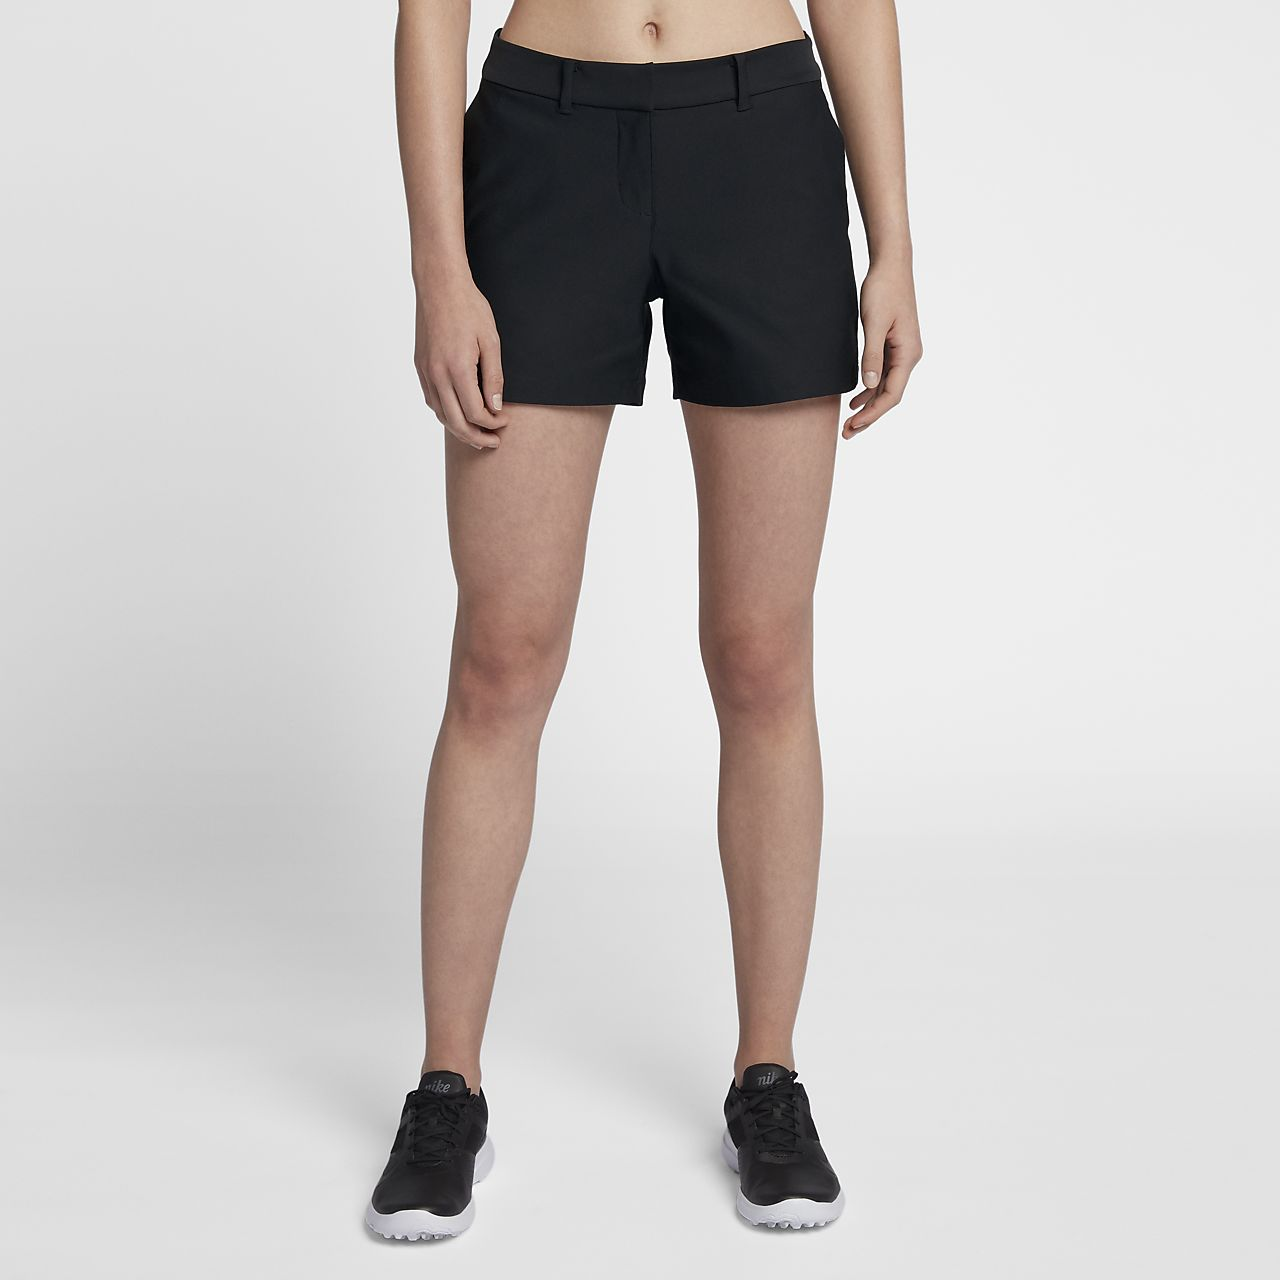 Golf Korte Broek Dames.Nike Flex Woven Golfshorts Van 11 5 Cm Dames Nike Com Be